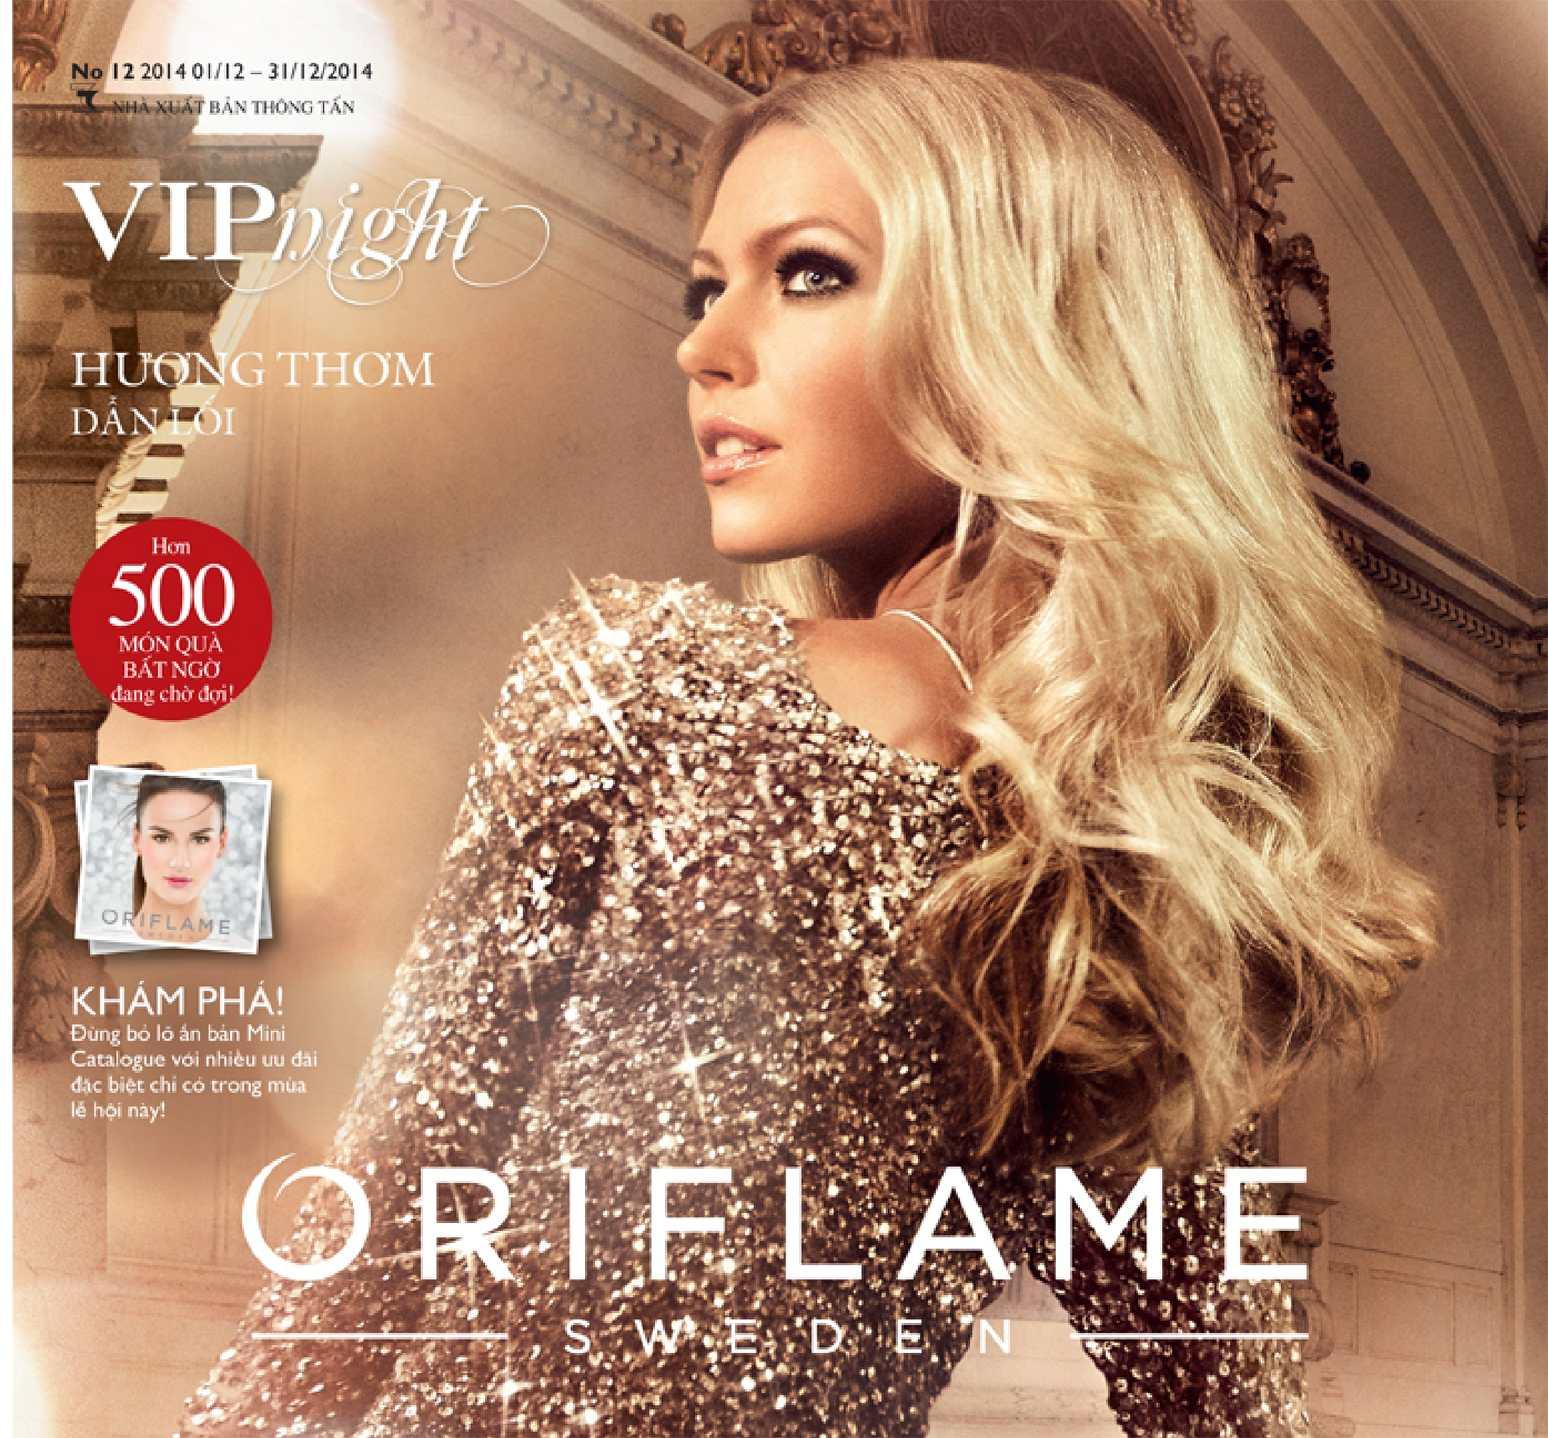 Catalogue My Pham Oriflame 12-2014